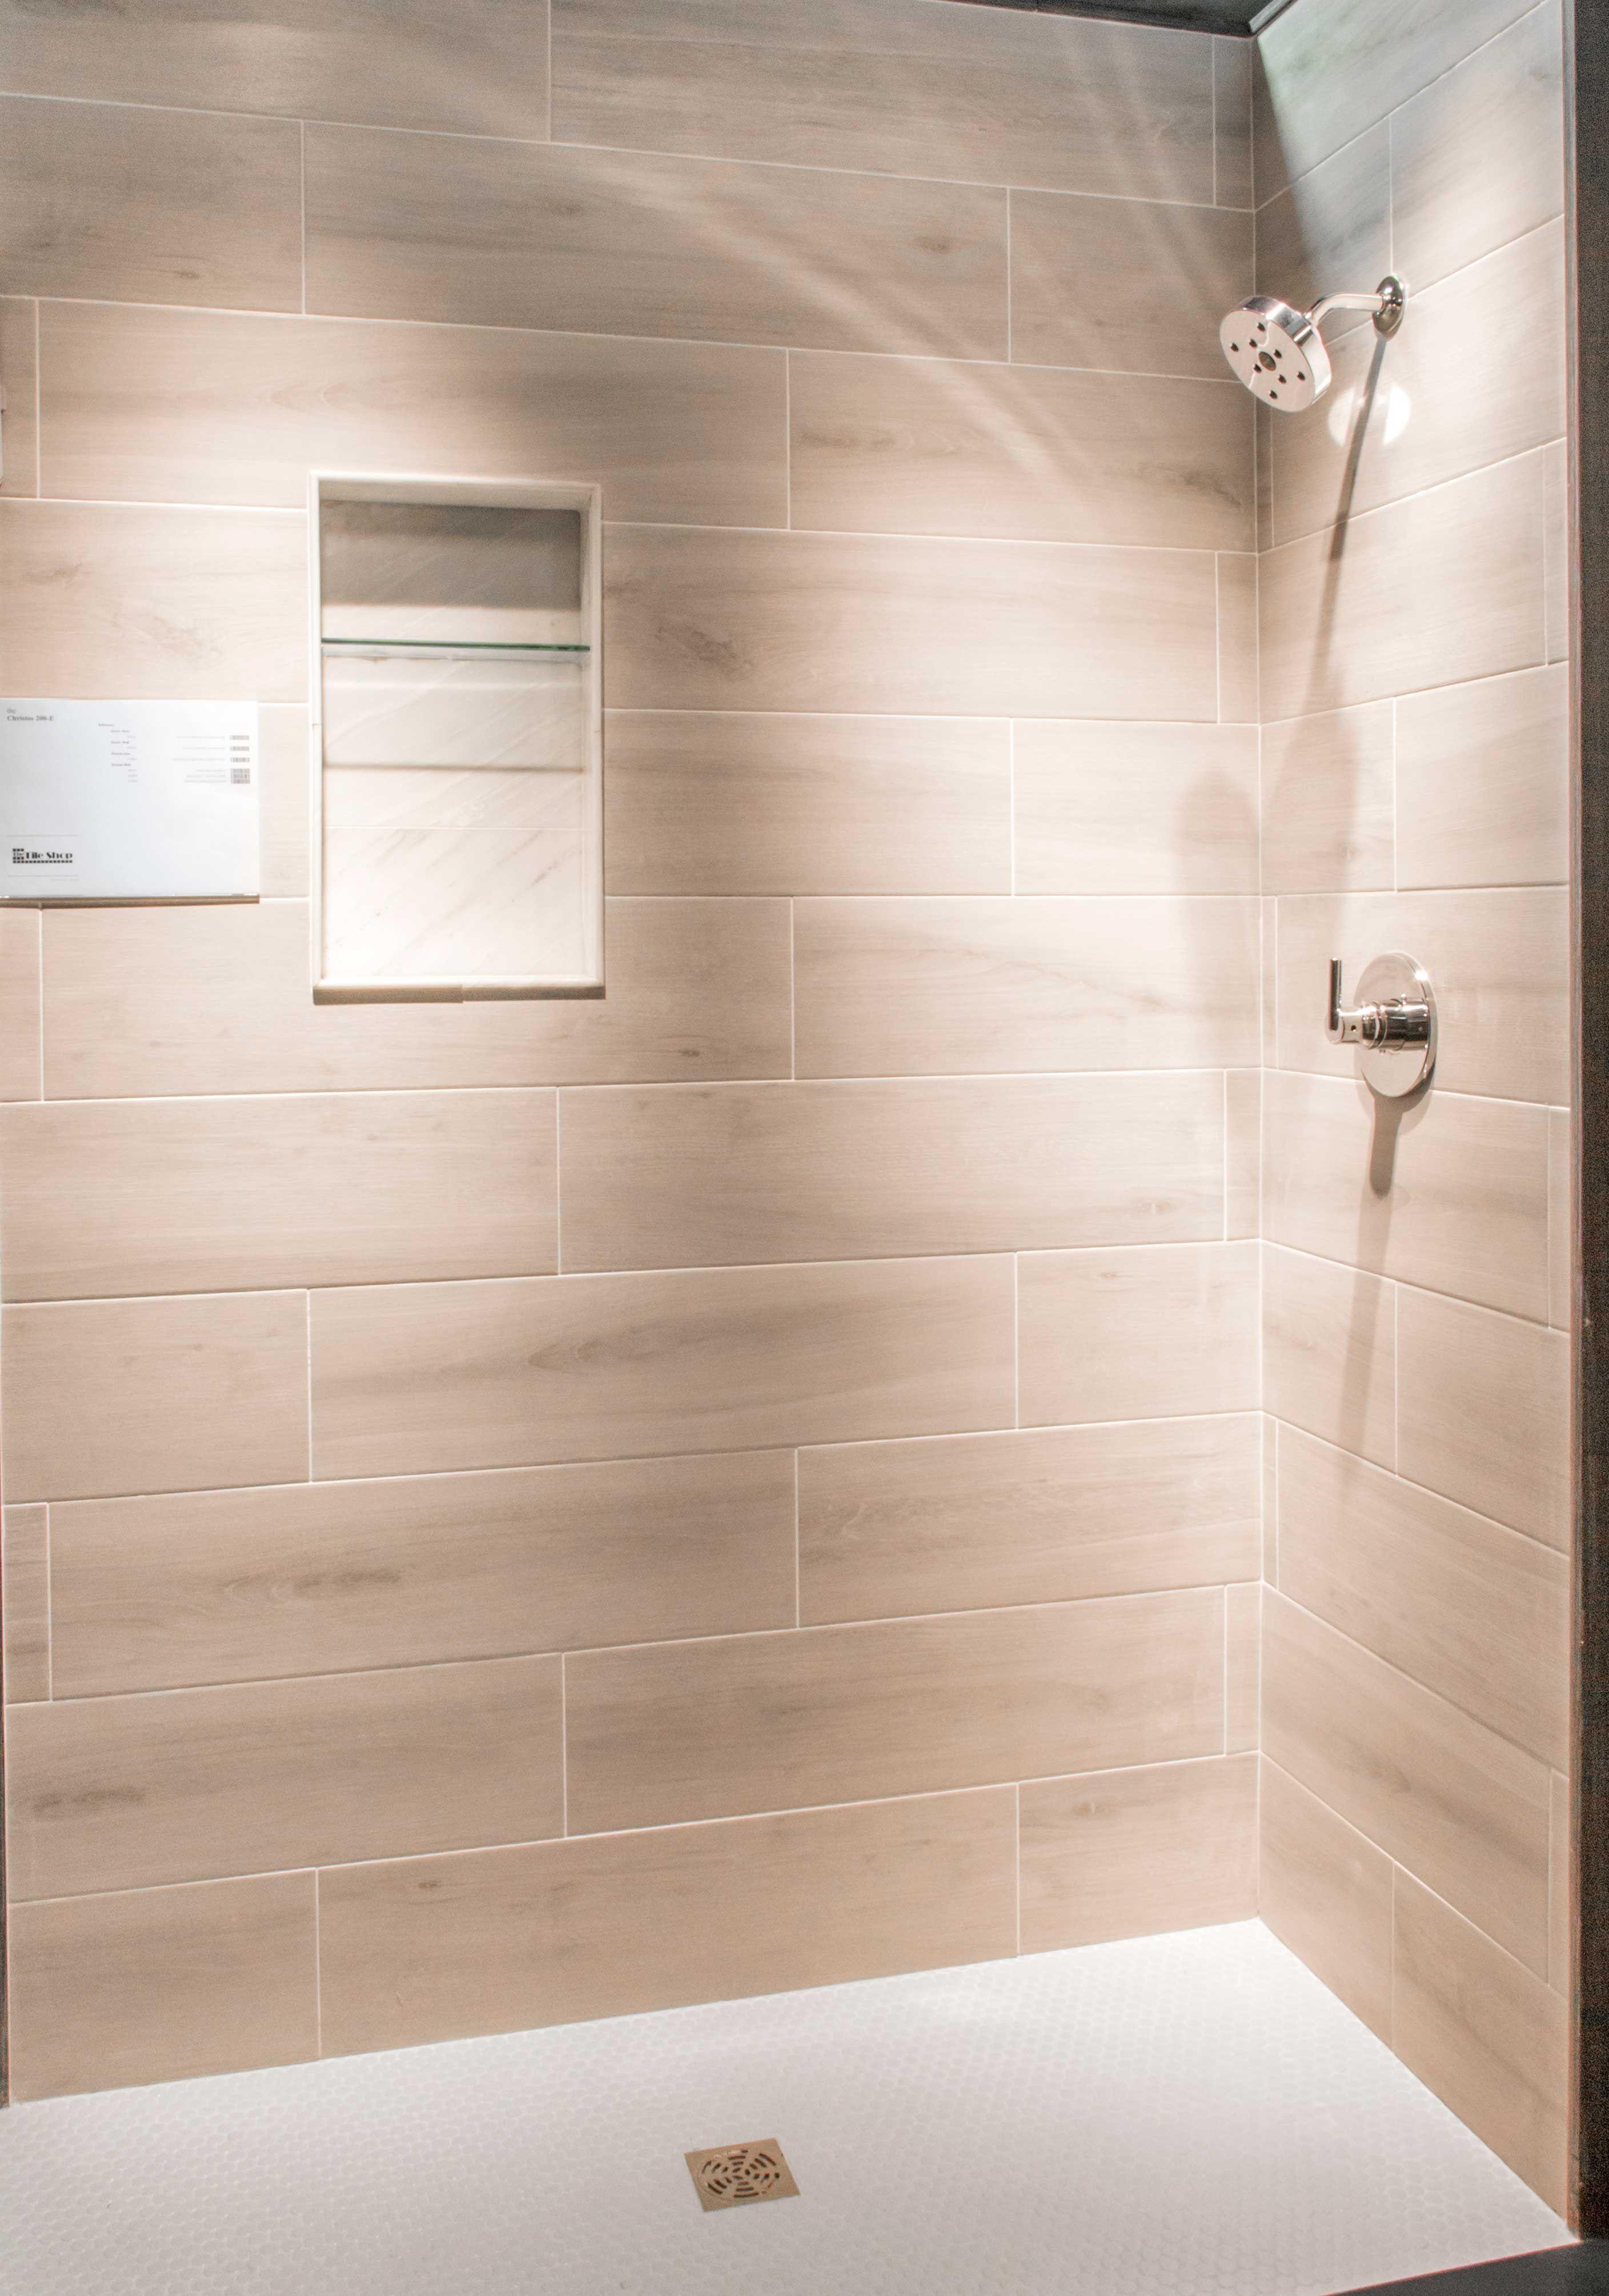 Bathroom Shower Wall Tile Bosco Cenere Faux Wood Wall And Floor Tile Bathroom Wall Panels Shower Wall Tile Bathroom Shower Walls